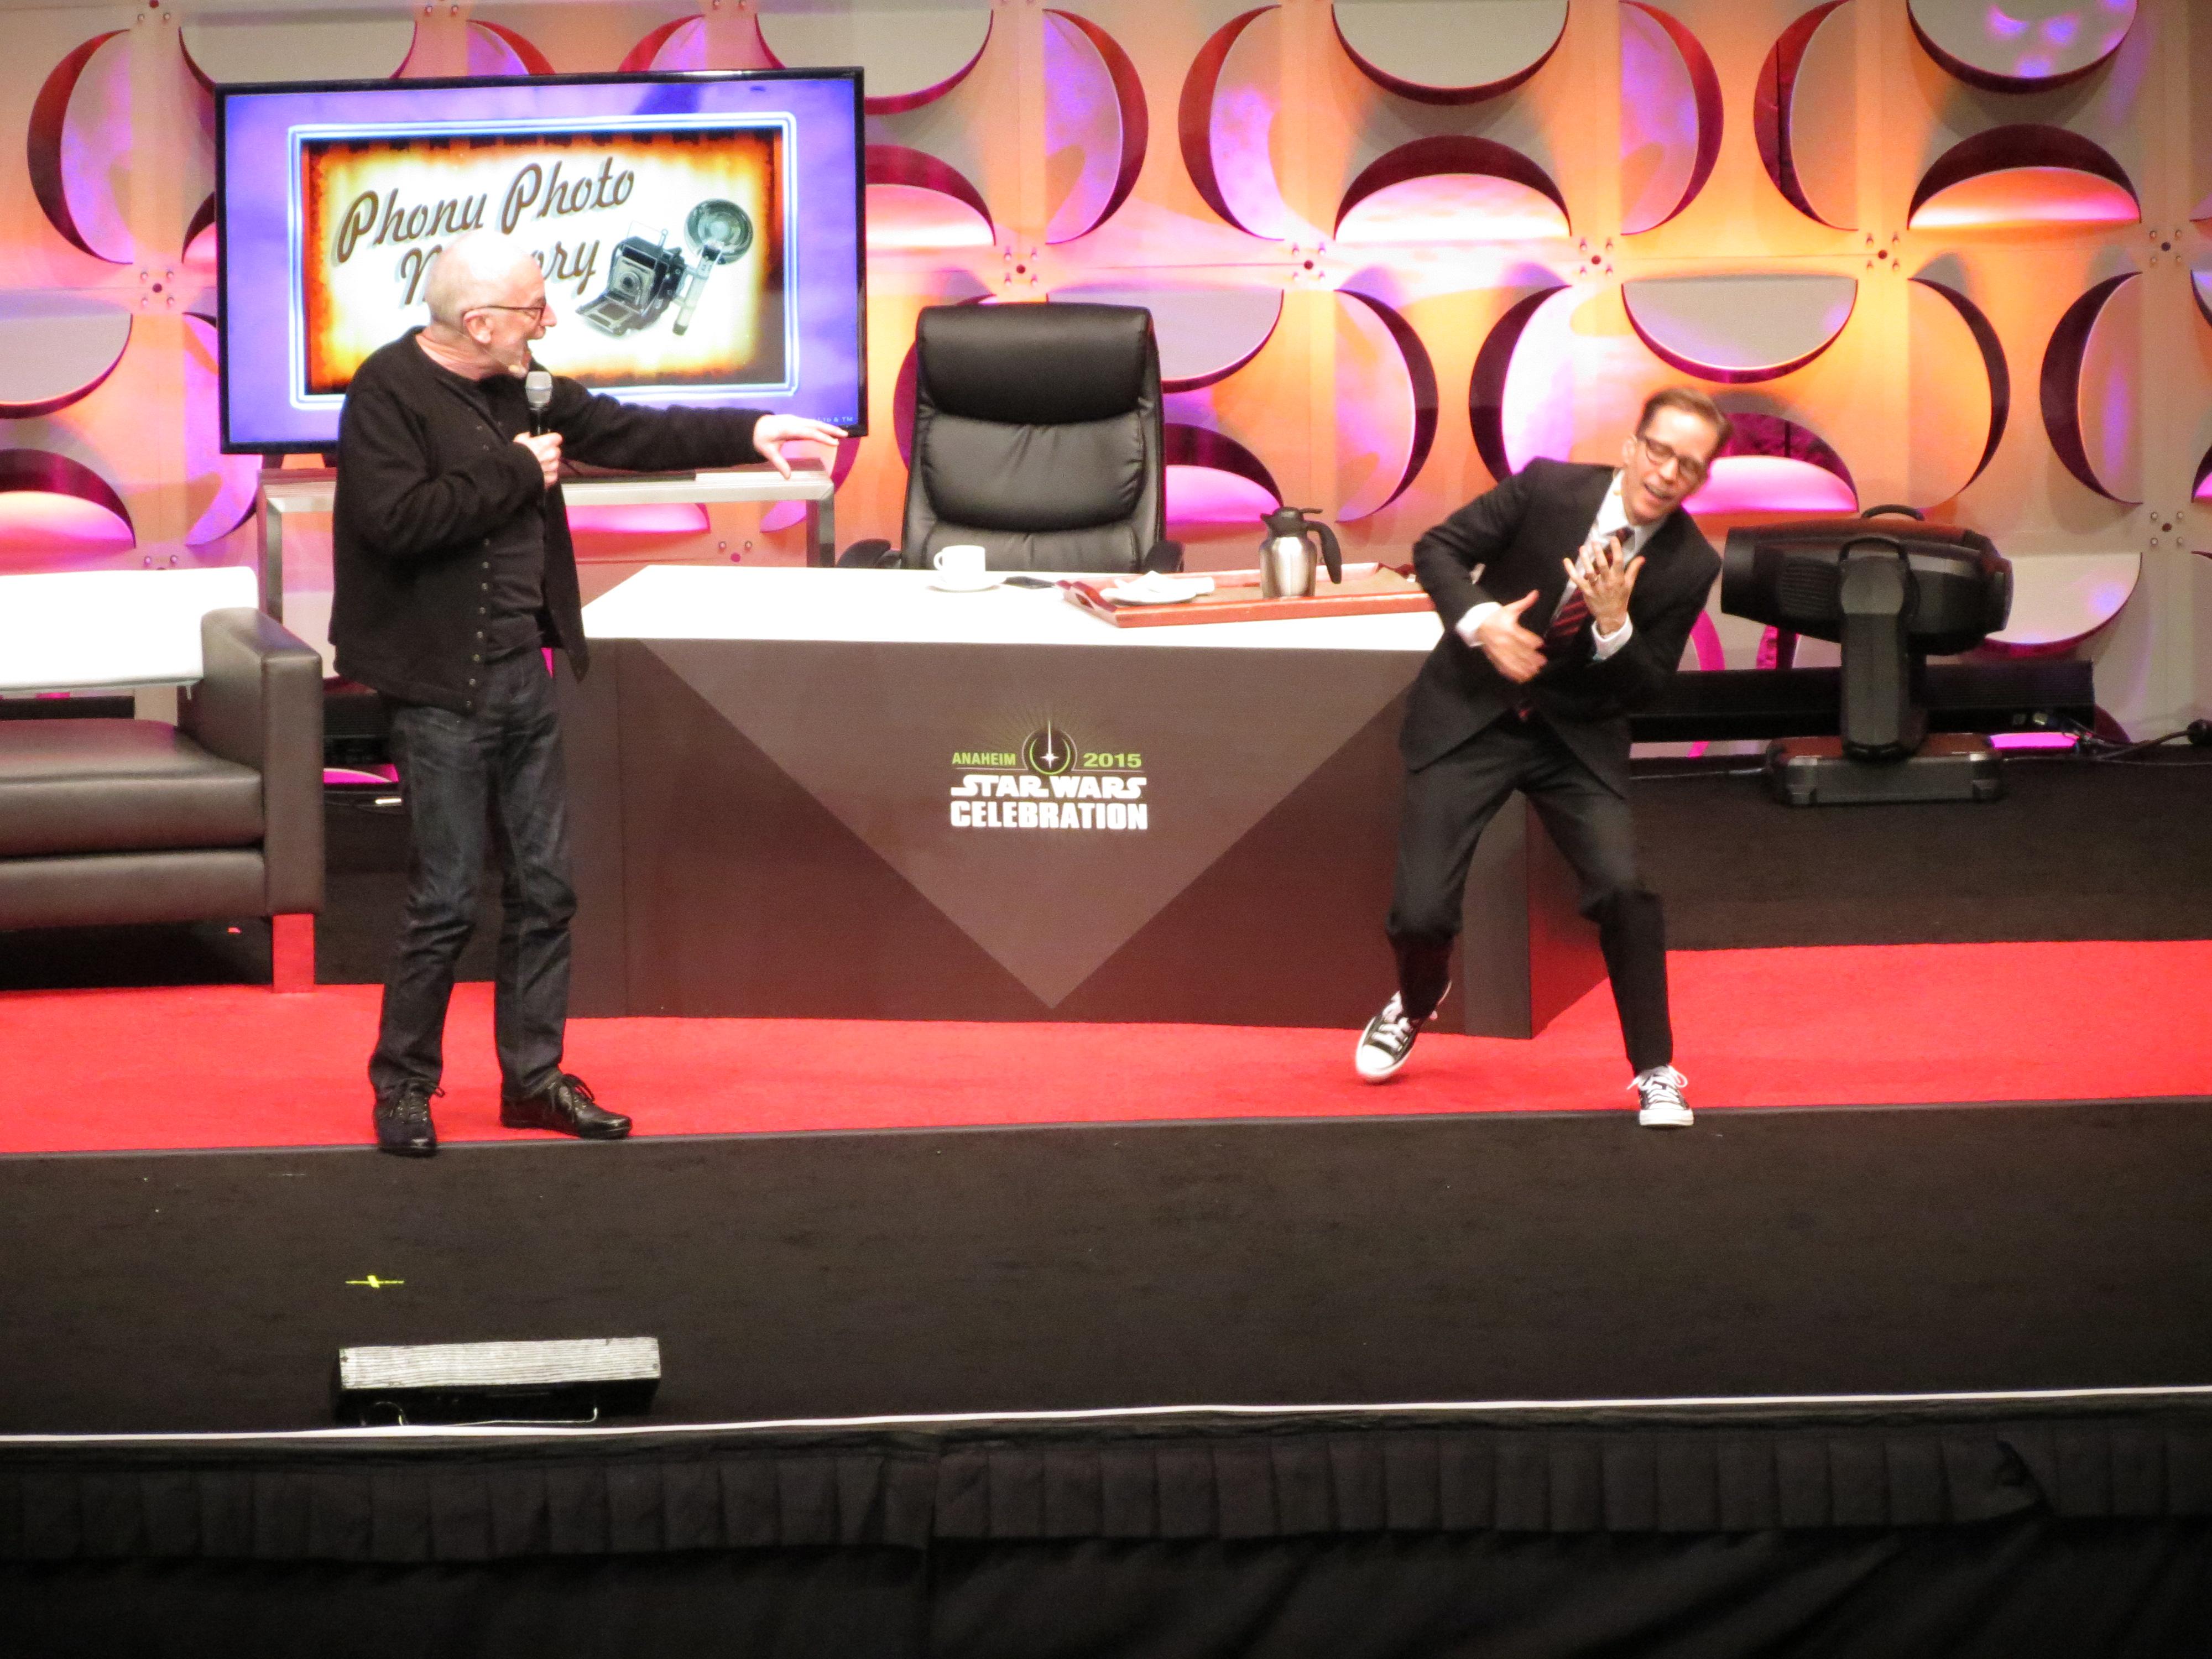 Ian Mcdiramid Live At Star Wars Celebration 2015!